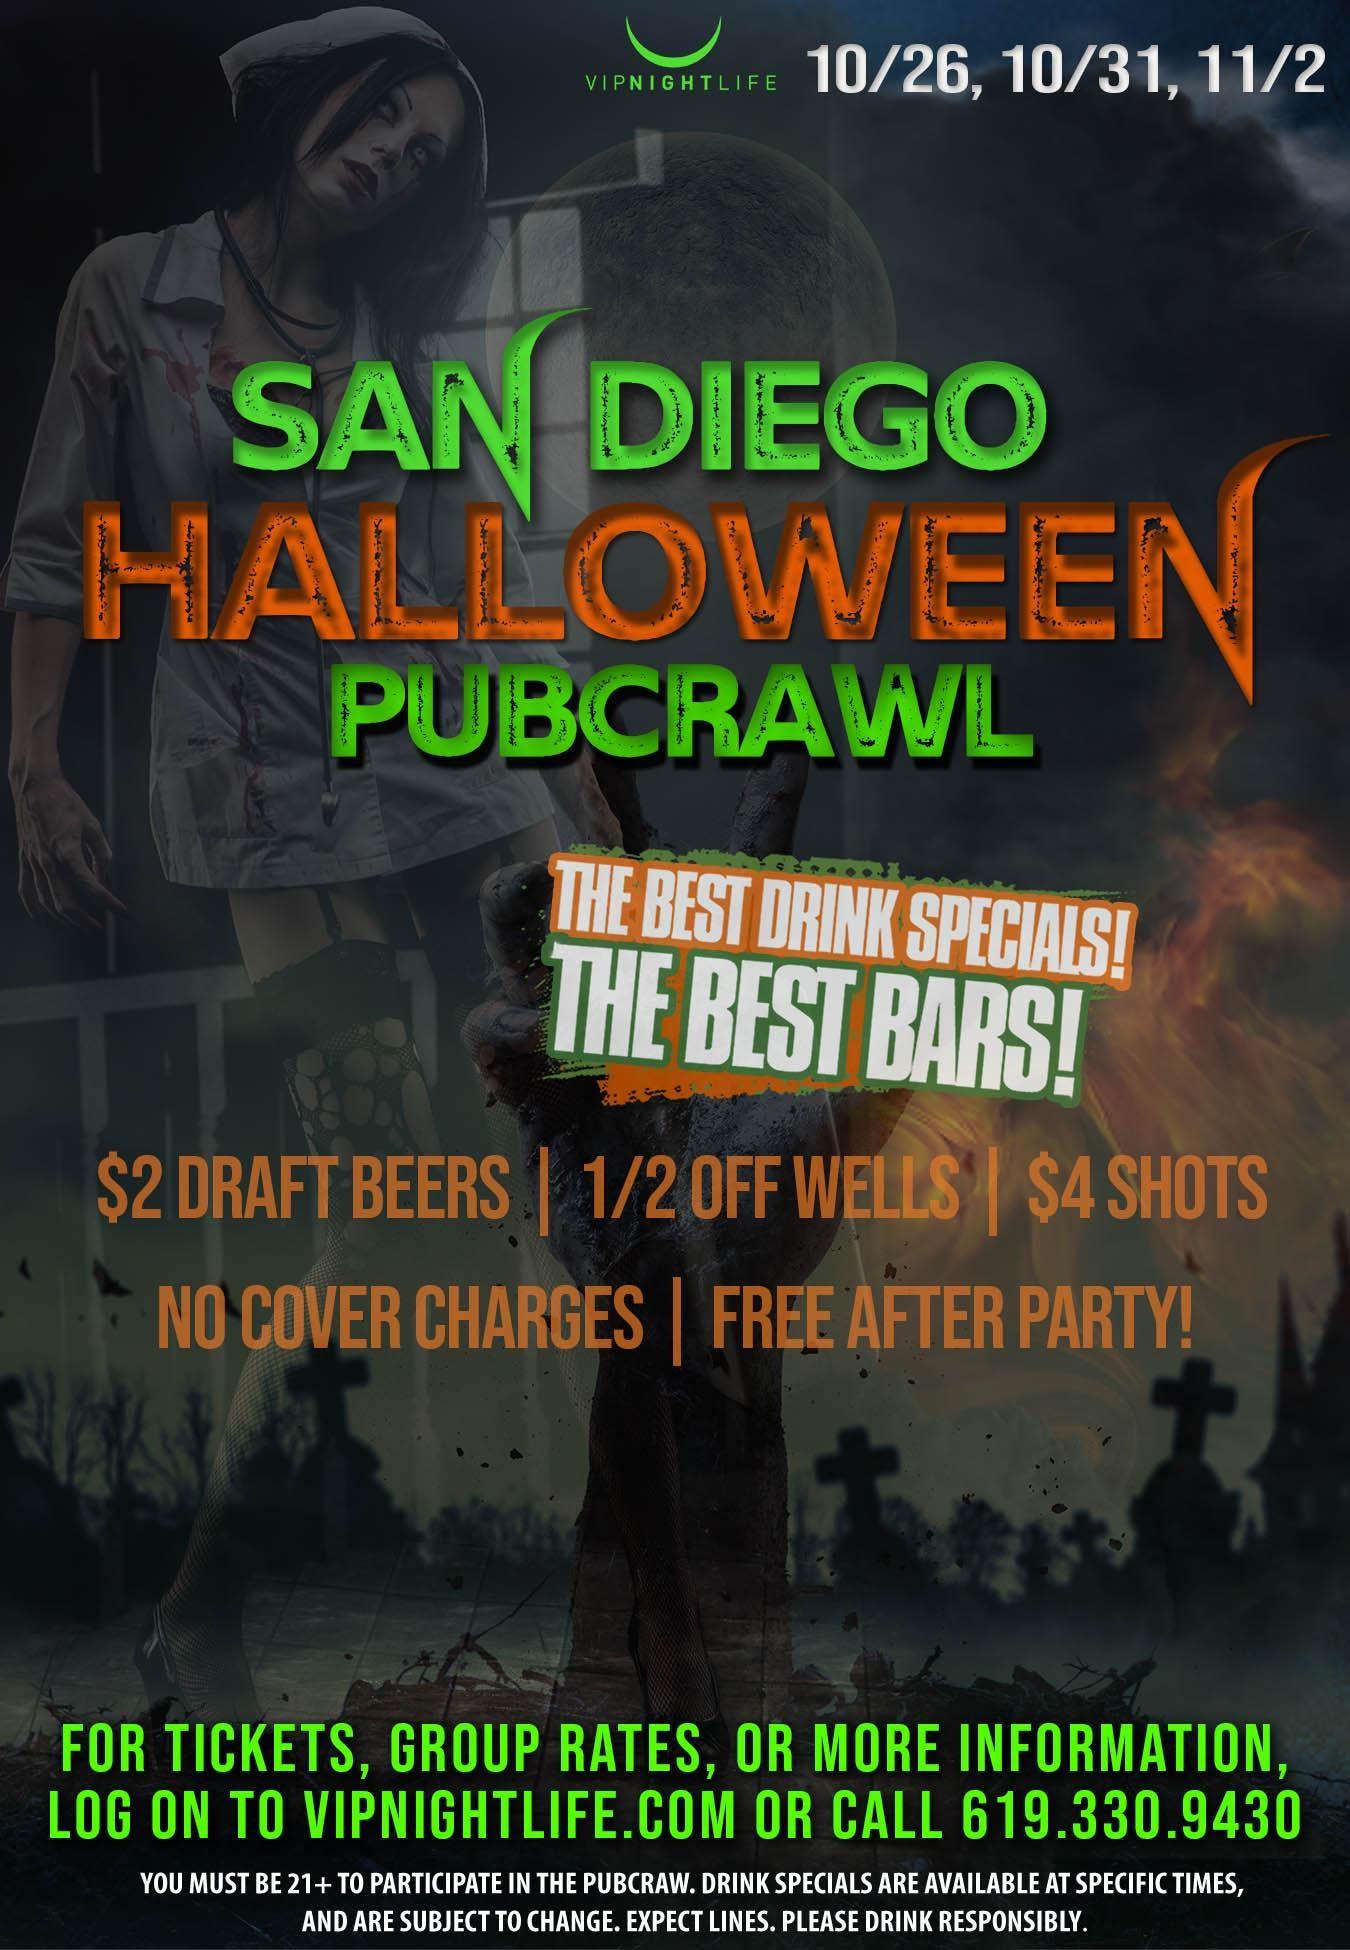 San Diego Halloween PubCrawl